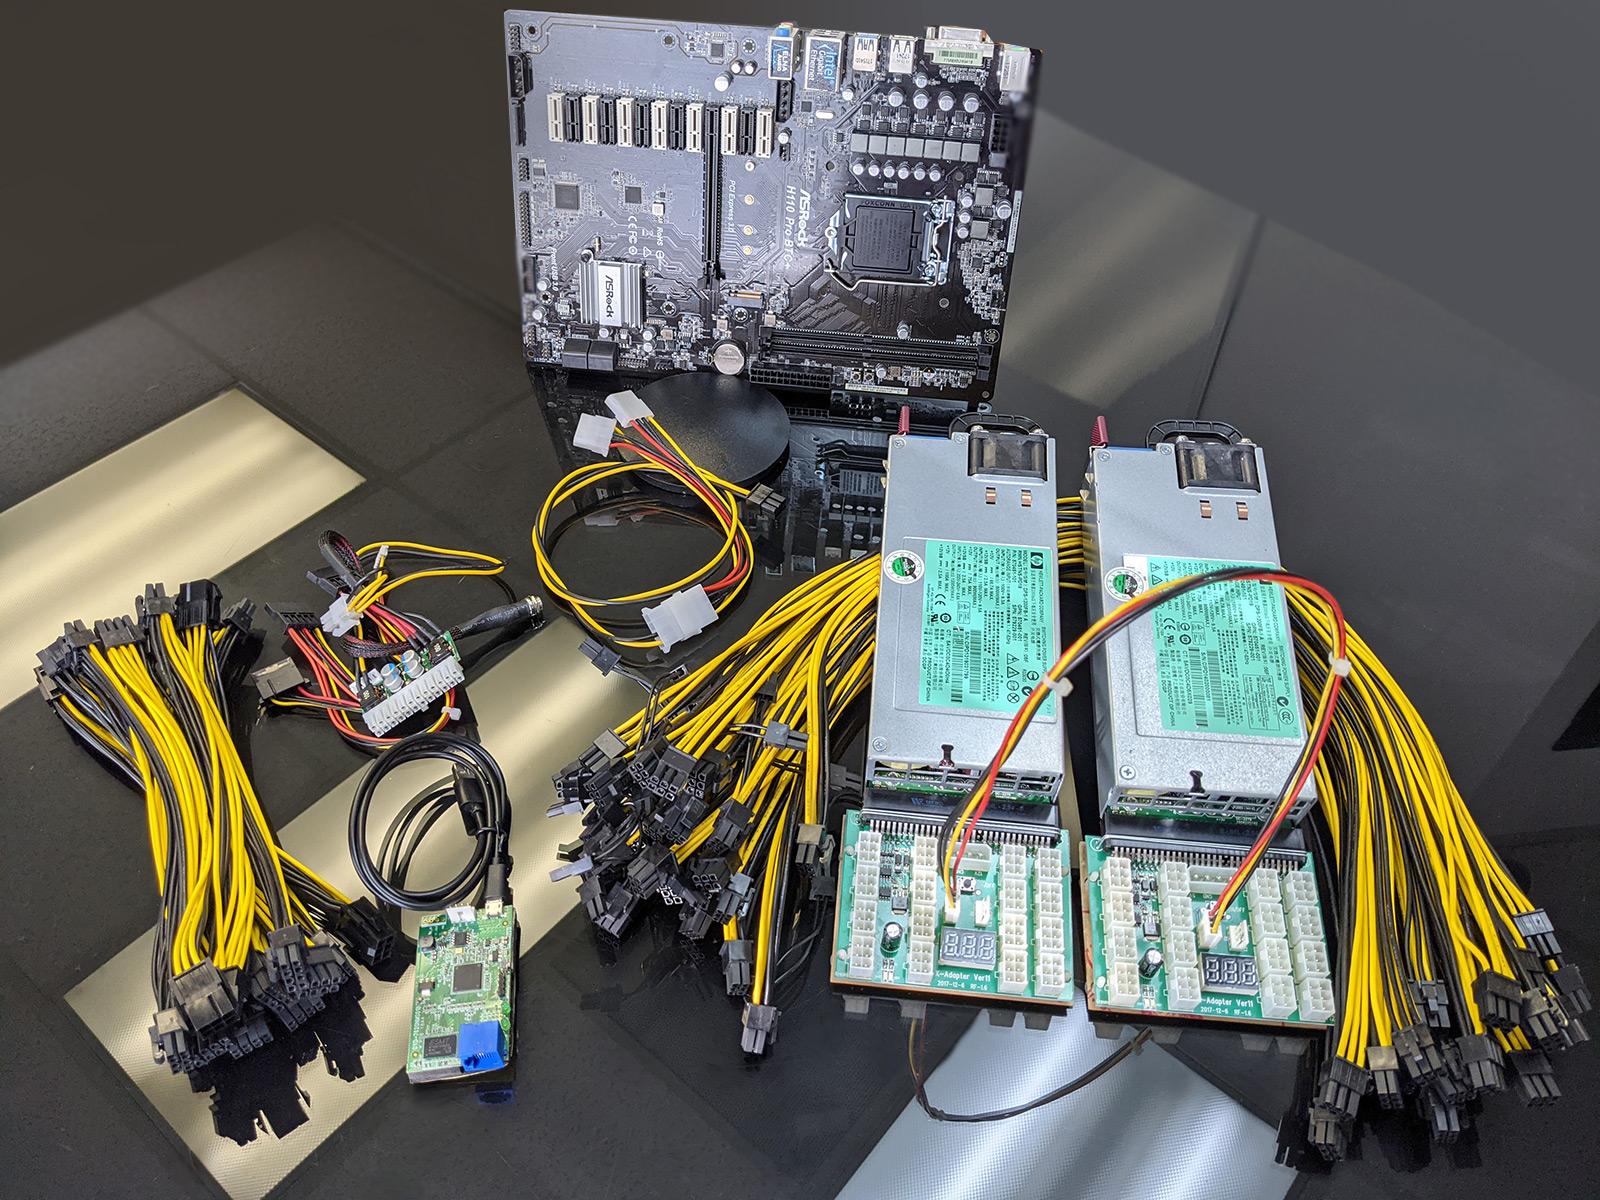 ASRock BTC PRO Kit, BTC Mining PCIe x1 to x16 Riser Card